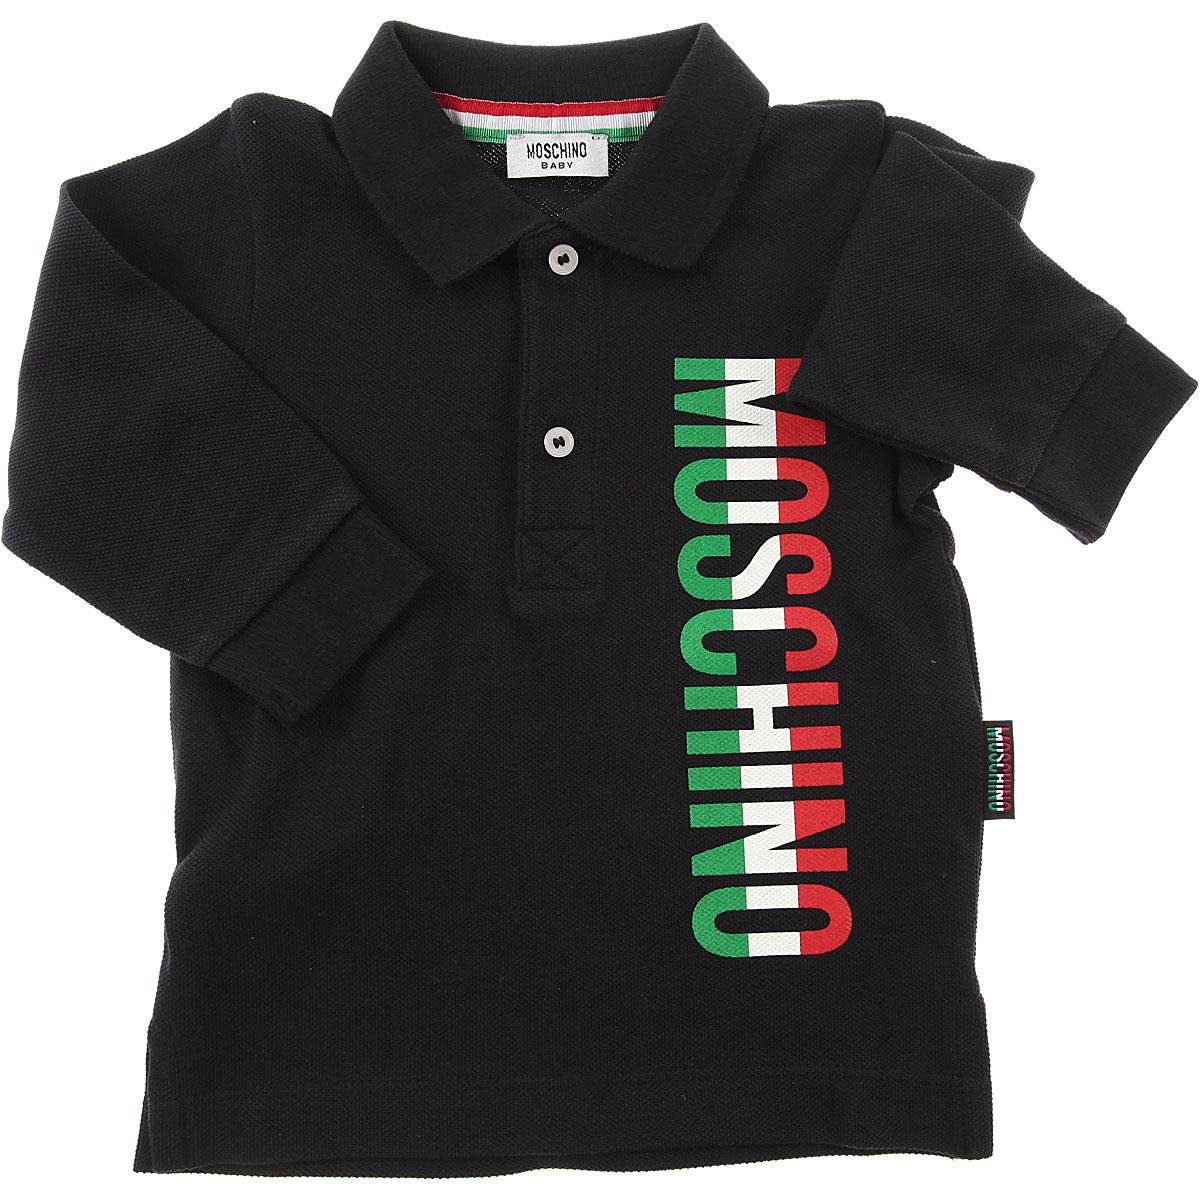 Image of Moschino Baby Boy Clothing, Black, Cotton, 2017, 24M 2Y 3Y 9M